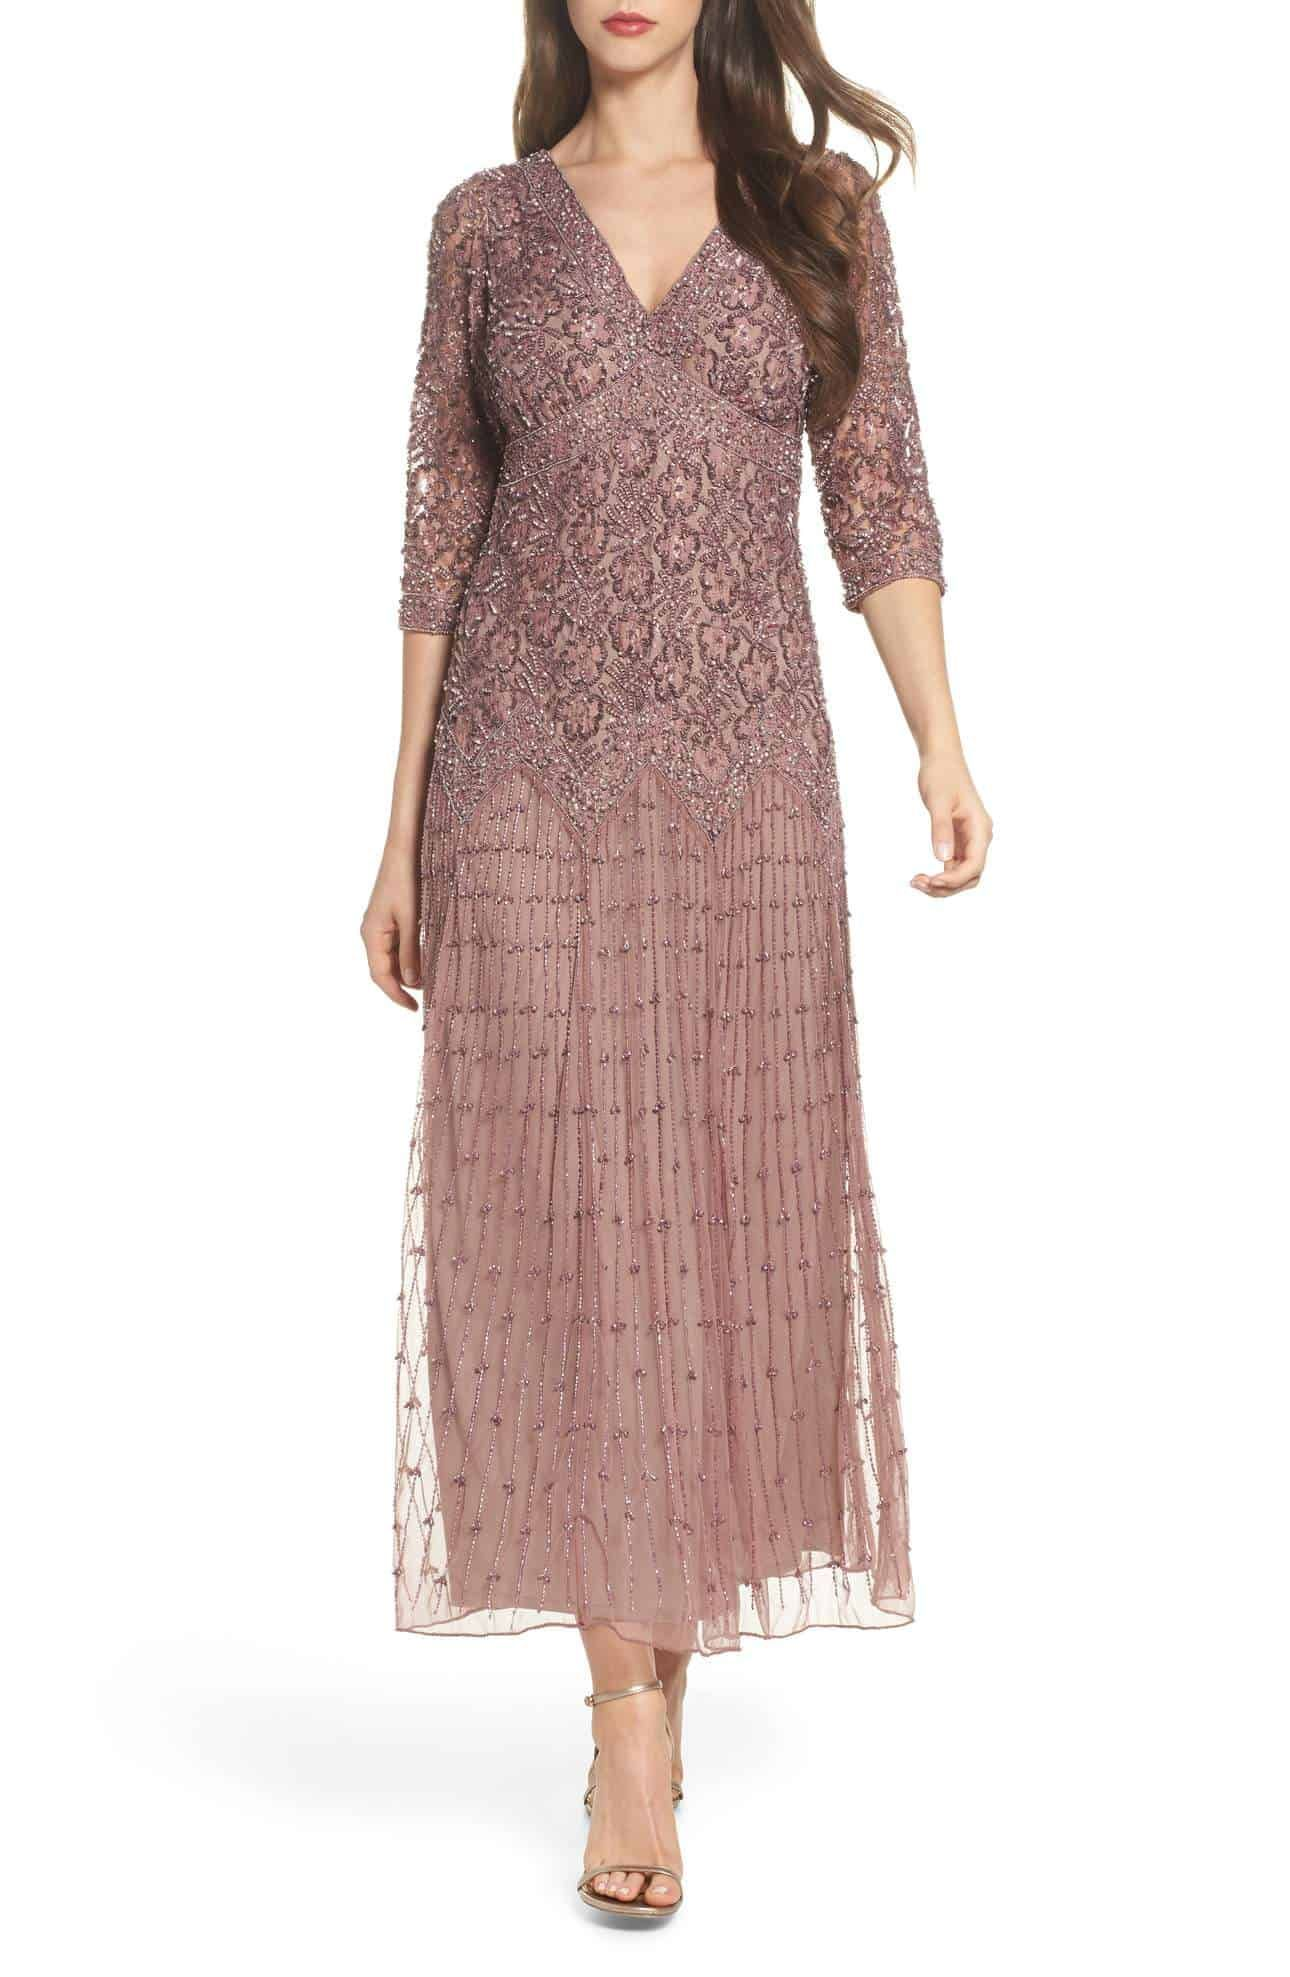 Long Sleeve Mother Of The Bride Dress Mauve Beaded Gown For Mother Of The Bride Or Groom Beaded Mesh Dress Mesh Dress Dresses